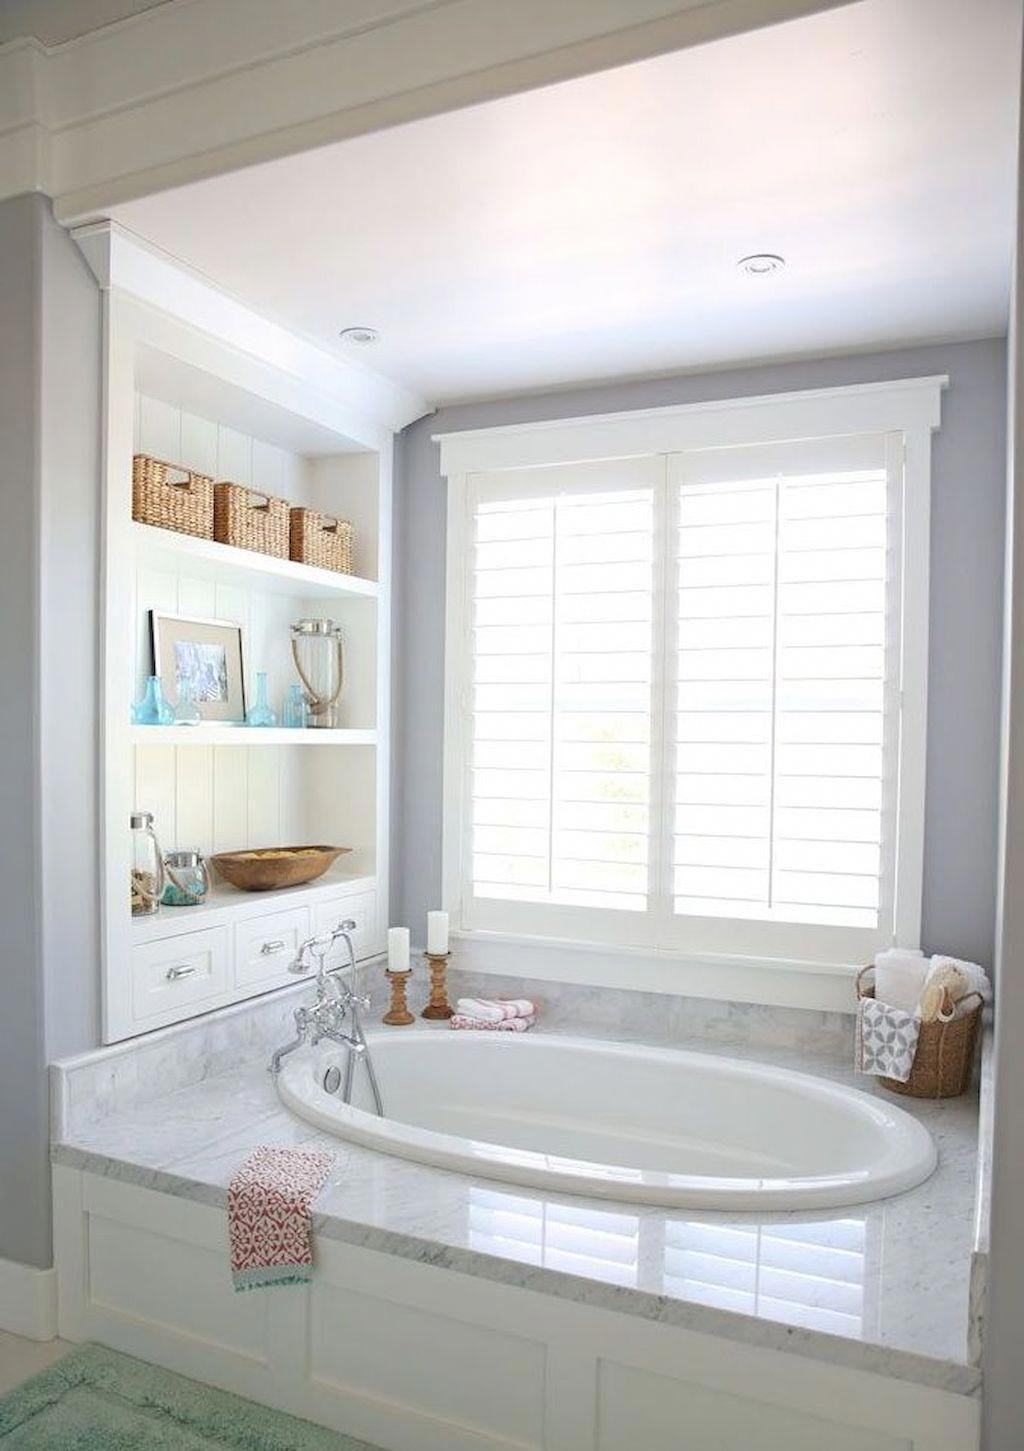 examine below for bath renovation in 2020 bathroom on bathroom renovation ideas 2020 id=45213